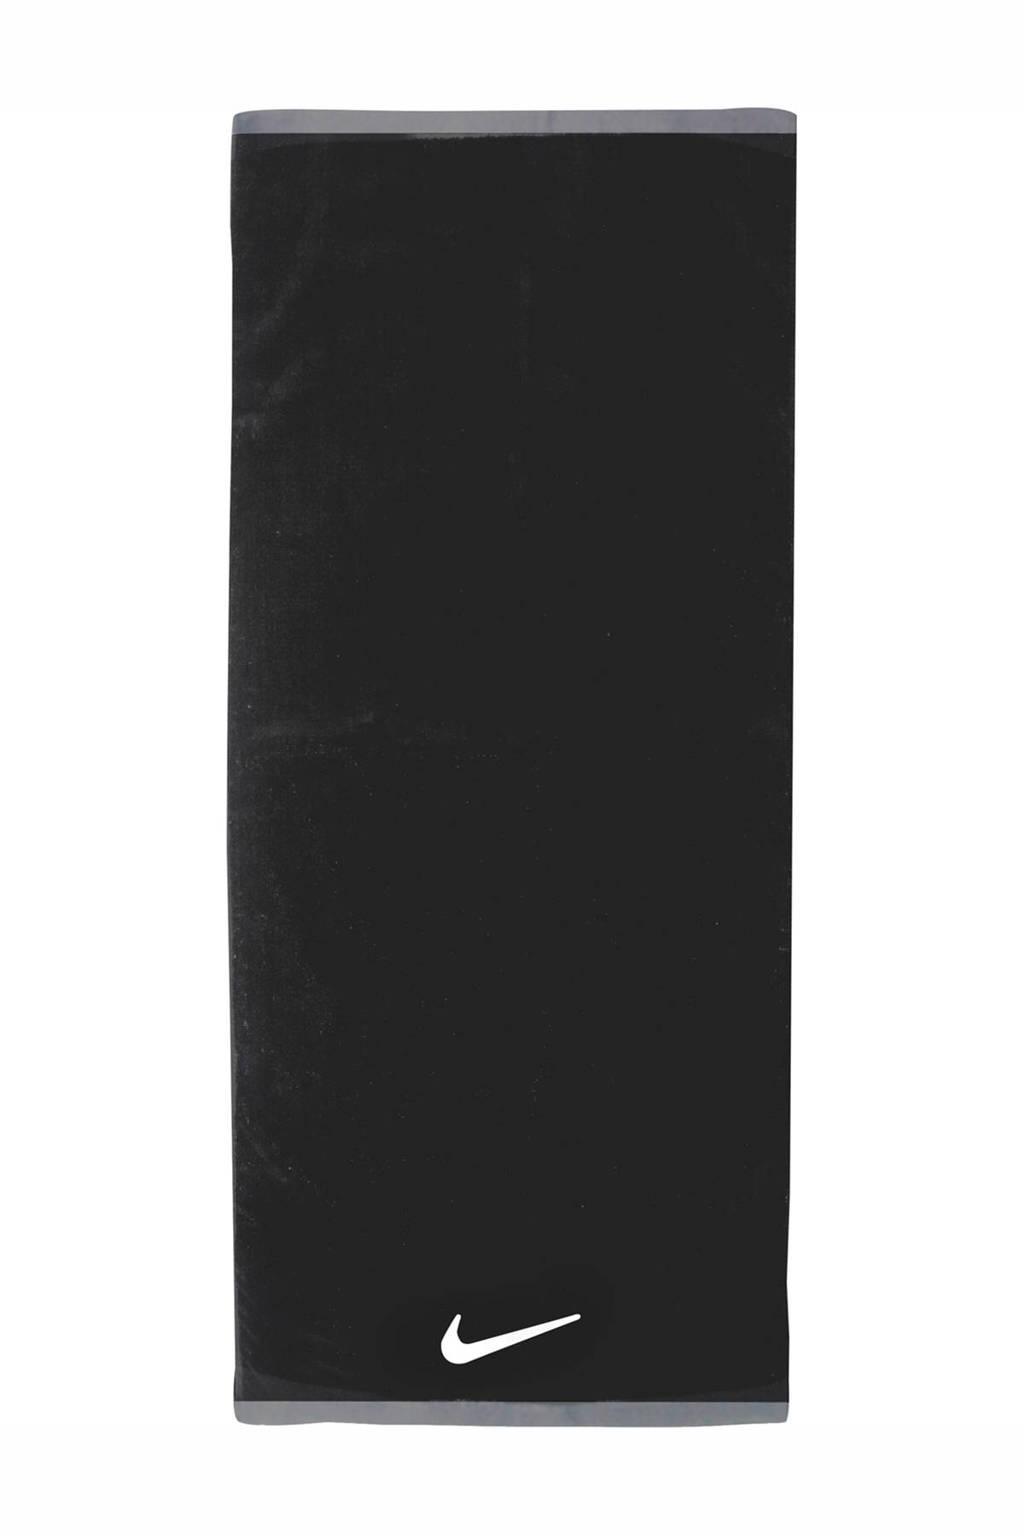 Nike   sporthanddoek Fundamental L zwart/wit, Zwart/wit